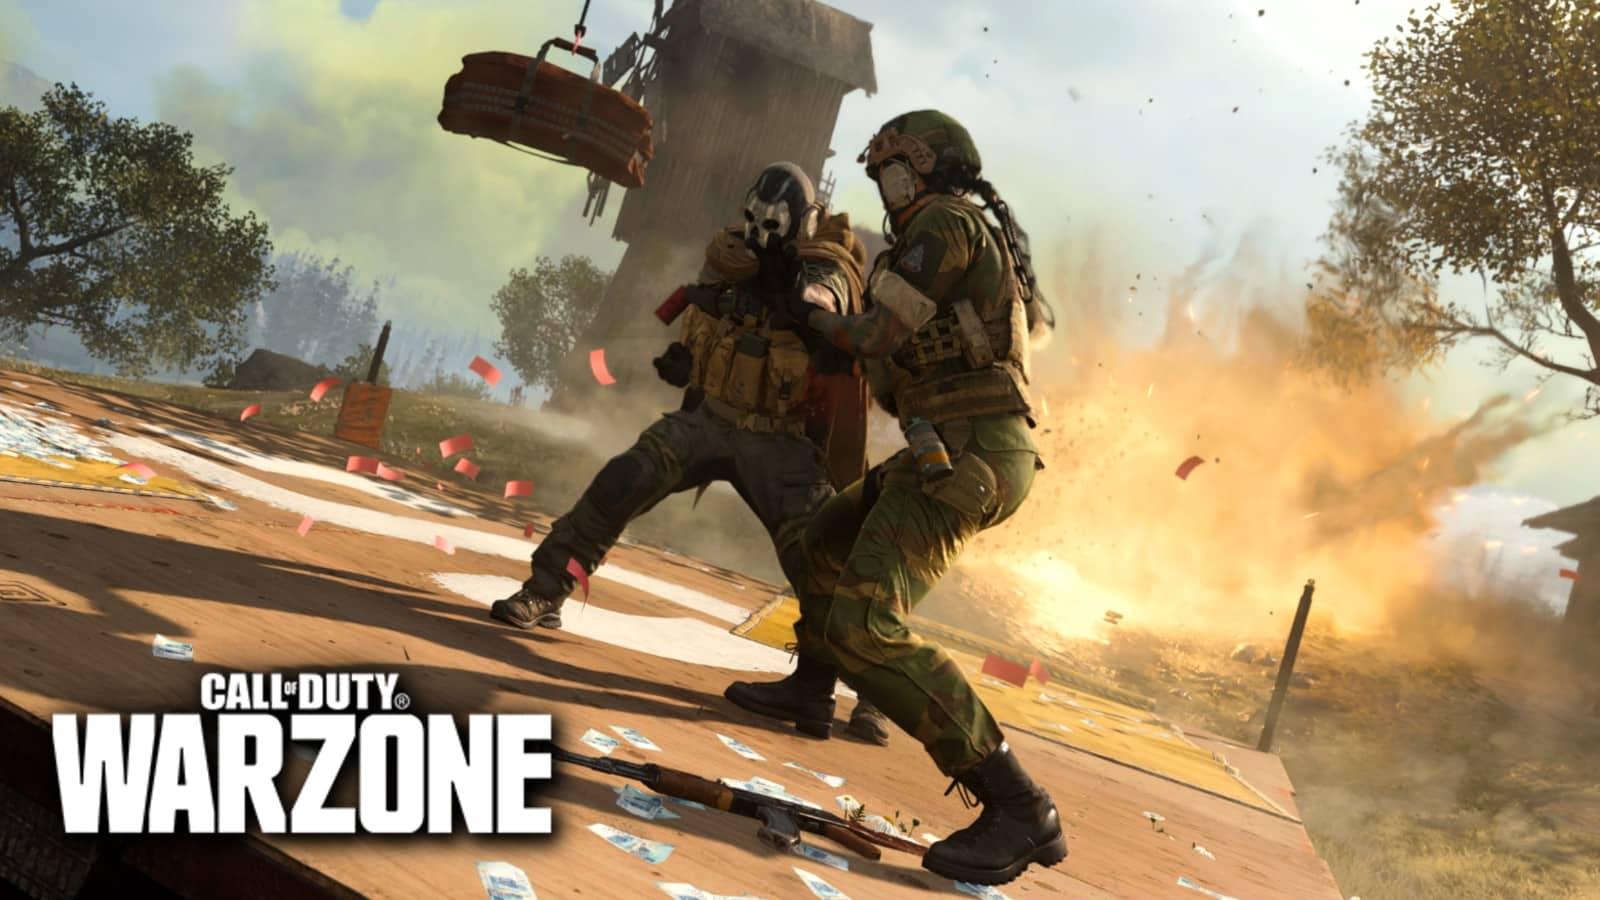 Warzone revenge